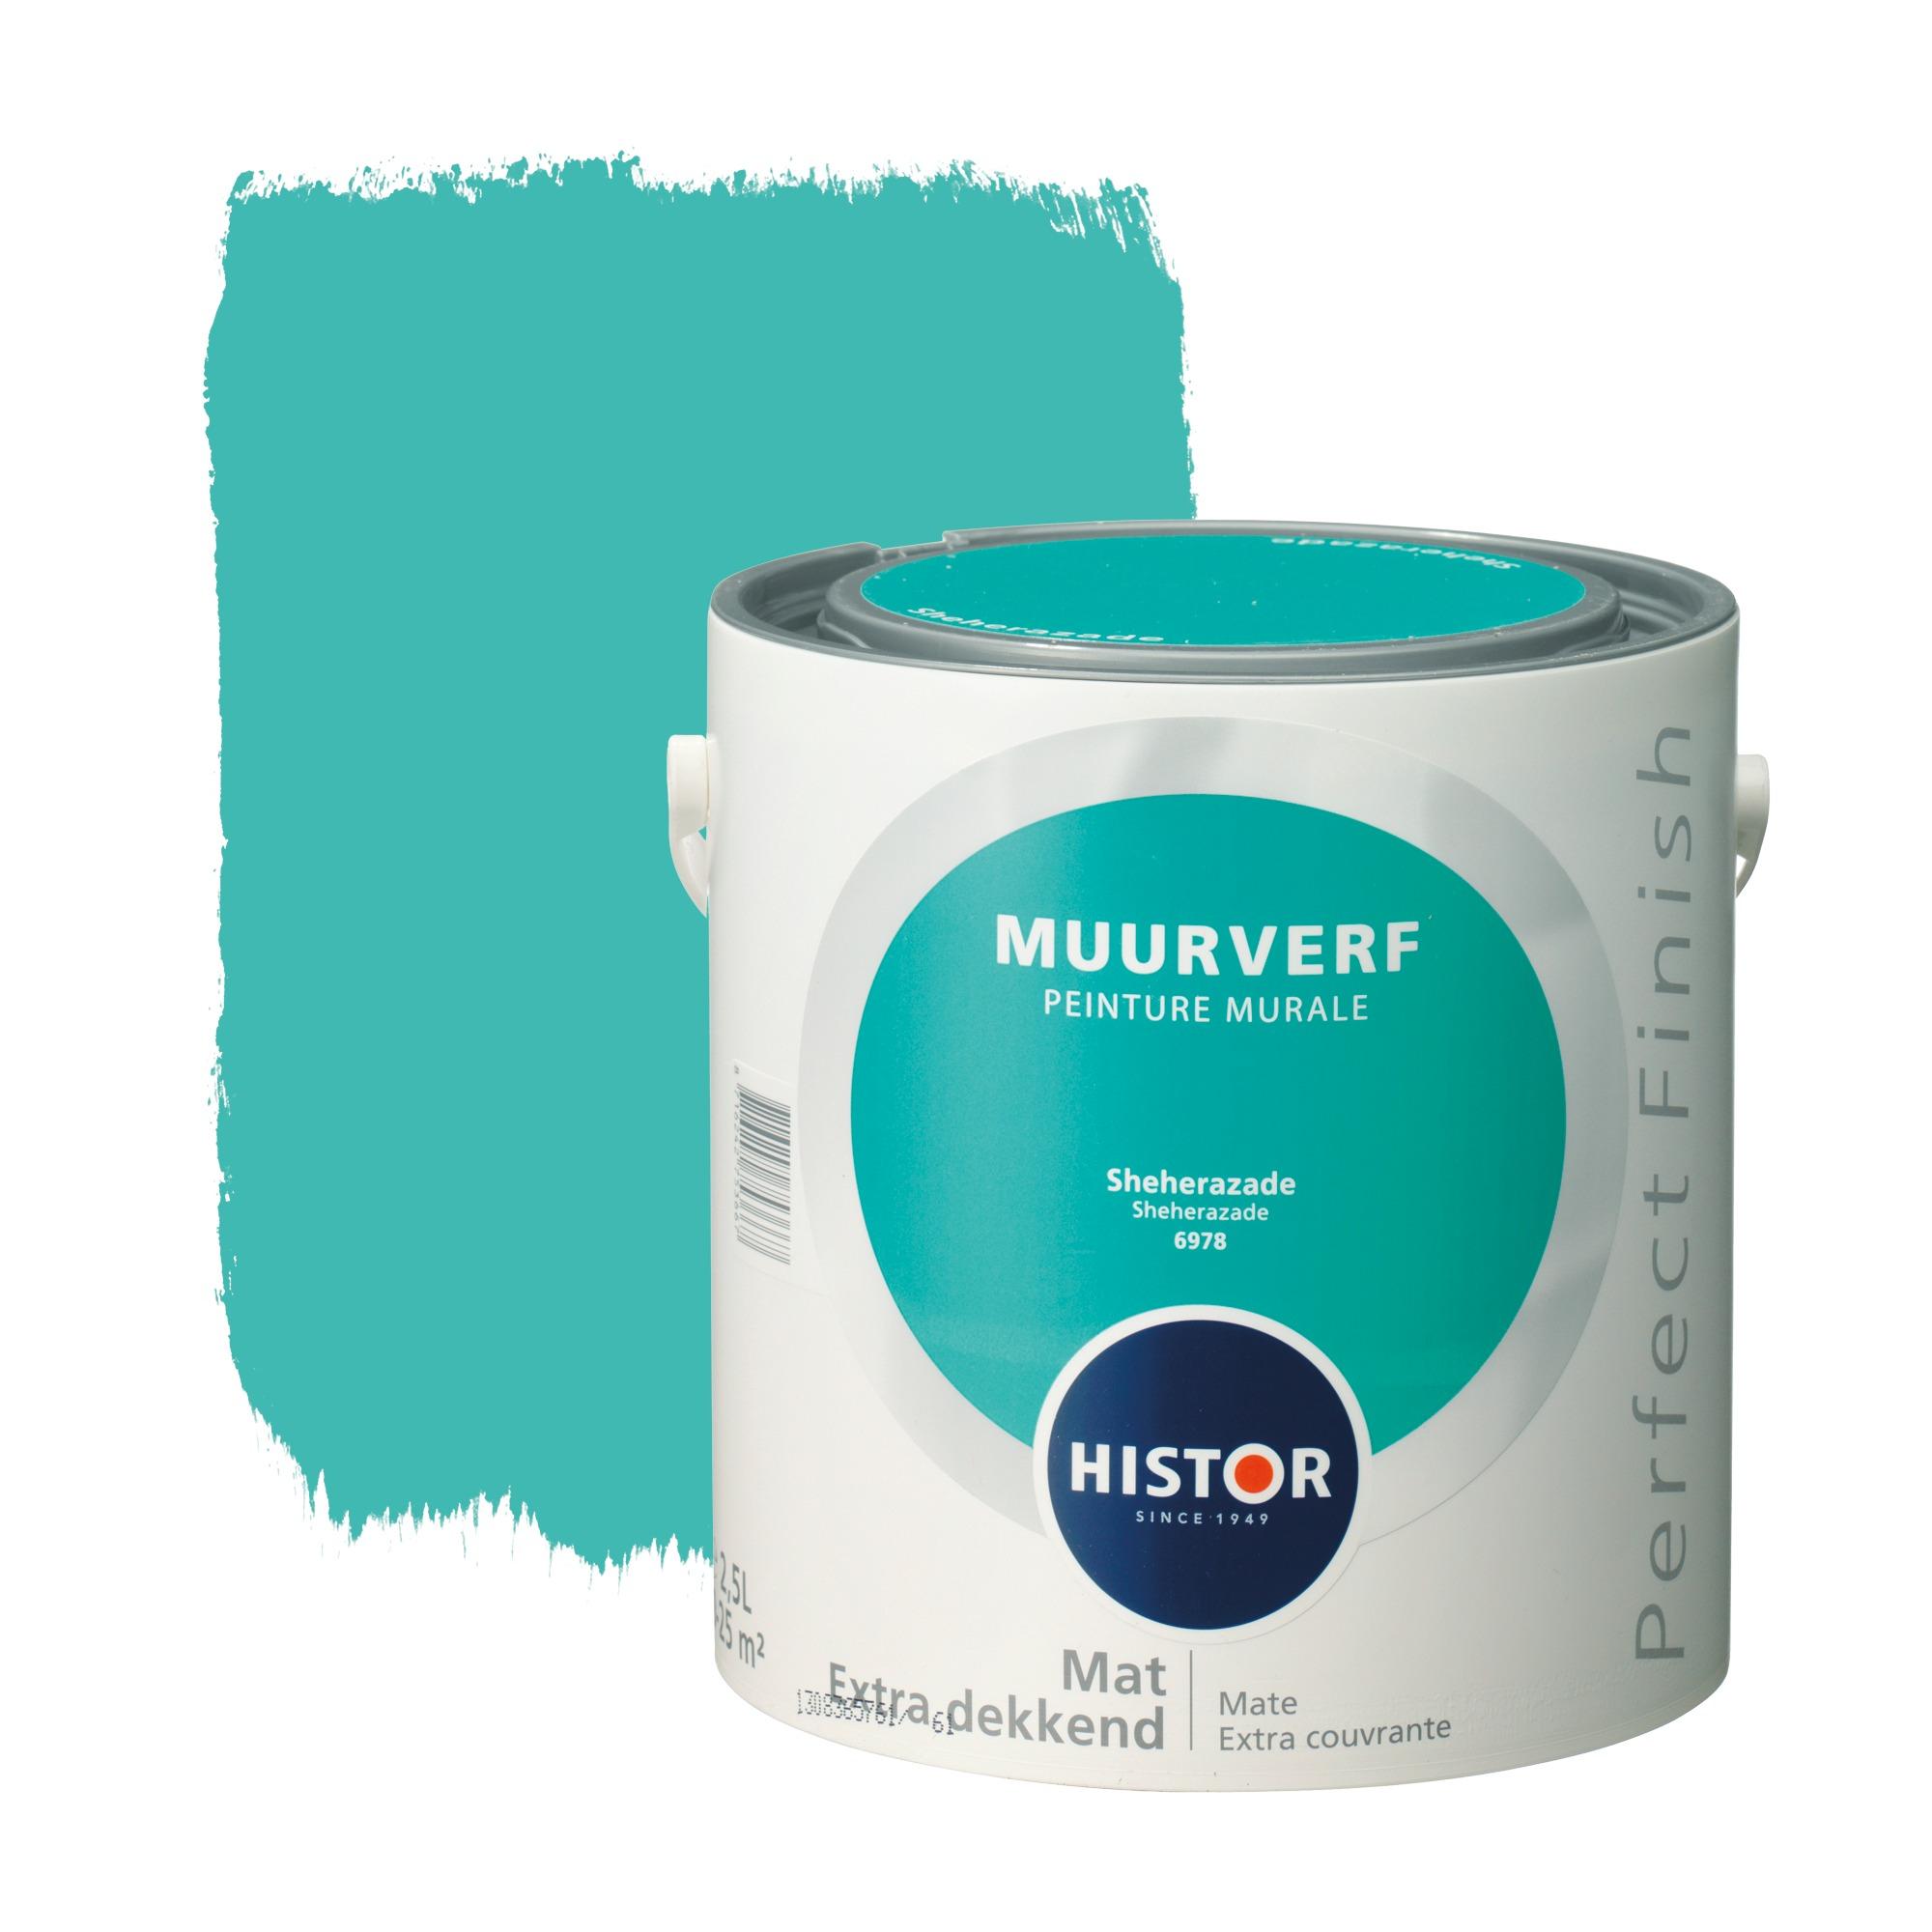 Histor perfect finish muurverf mat sheherazade 6978 2,5 l